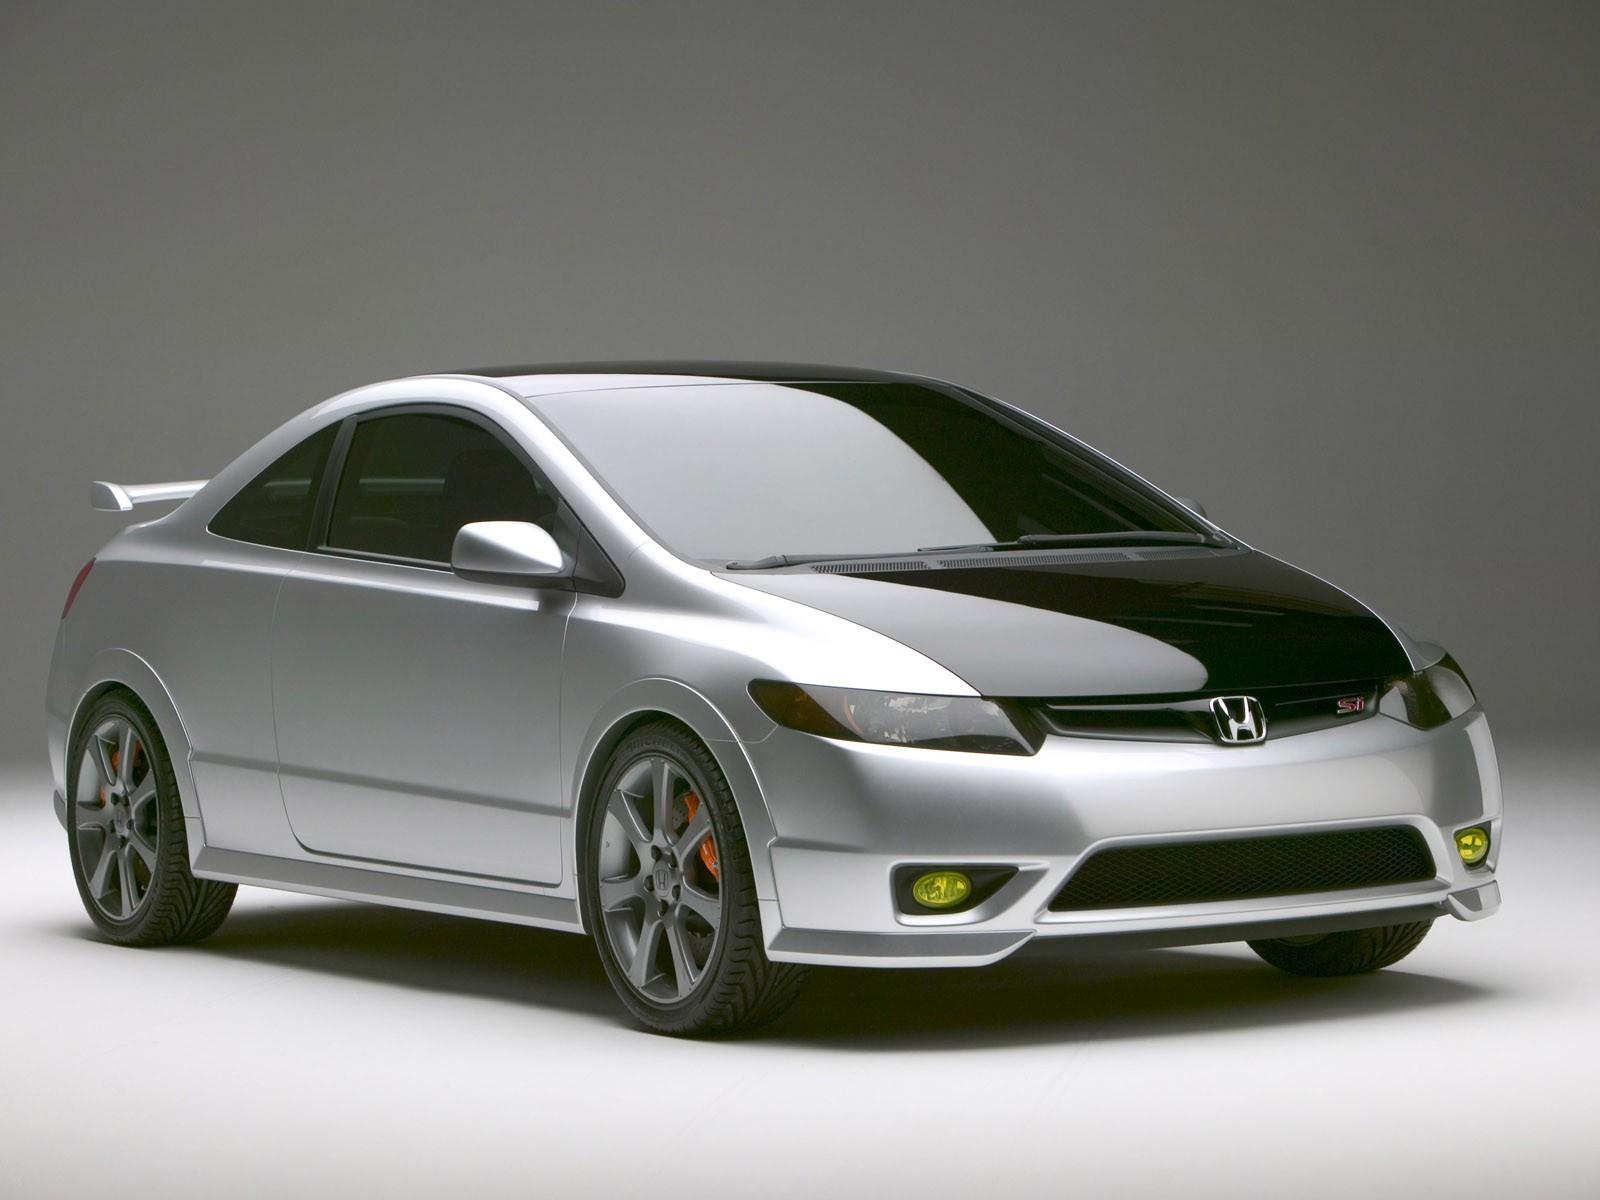 http://1.bp.blogspot.com/-wmPQpsNKxHU/TdBxb74Fz0I/AAAAAAAAALs/vX1eJRK4vXc/s1600/Honda-Civic-Si-Concept-2011-cars-wallpapers.jpg